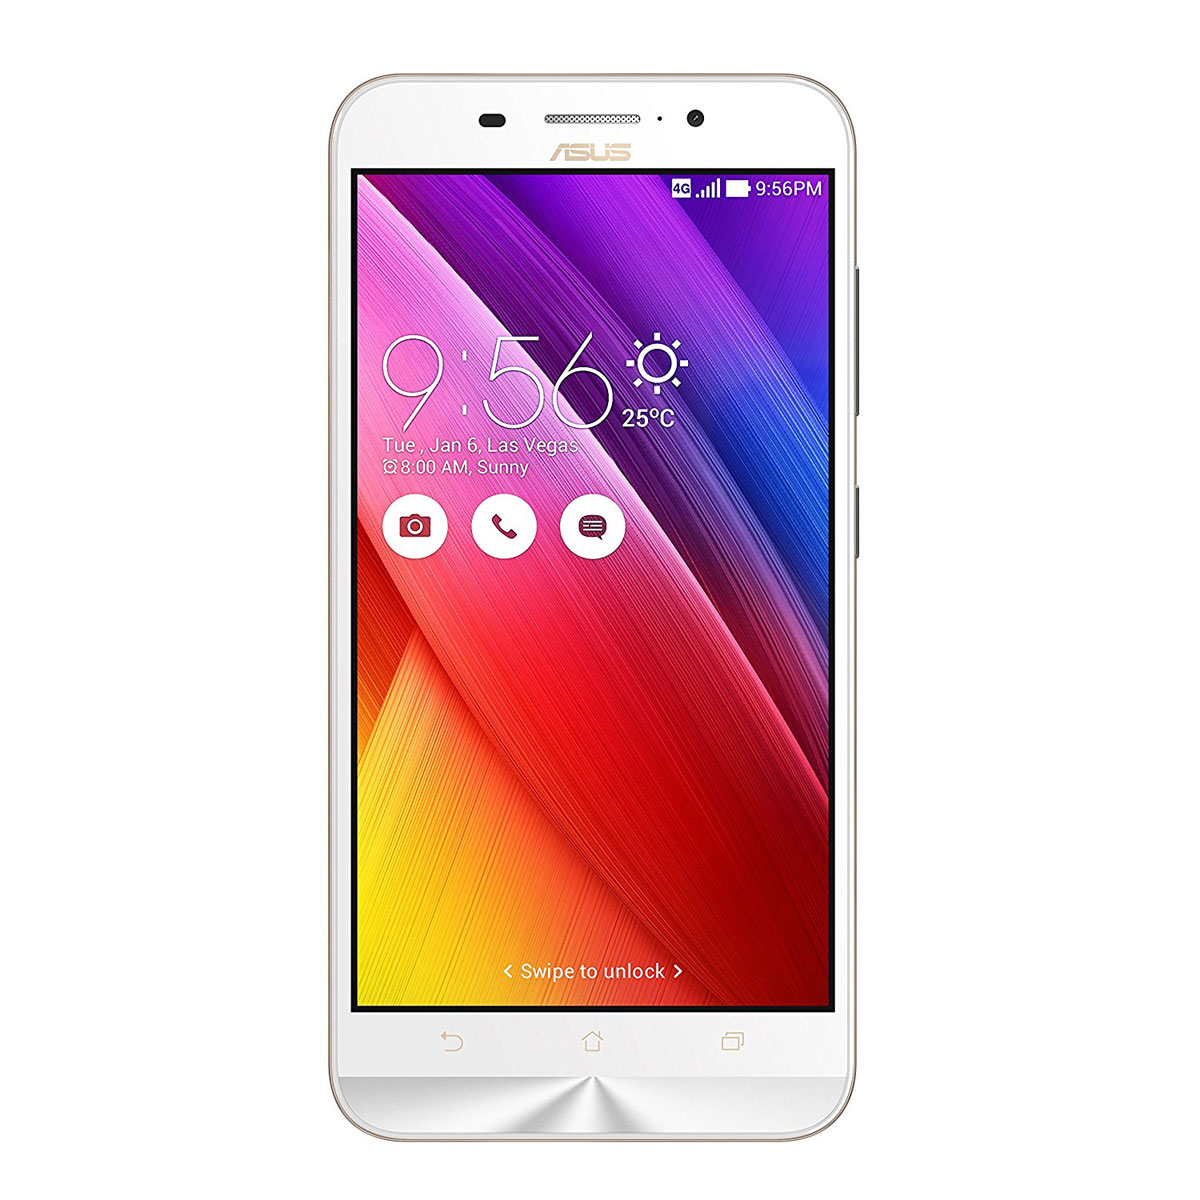 "Mobile & smartphone ASUS Zenfone Max ZC550KL Blanc Smartphone 4G-LTE Dual SIM - Snapdragon 410 Quad-Core 1.2 GHz - RAM 2 Go - Ecran tactile 5.5"" 720 x 1280 - 16 Go - Bluetooth 4.0 - 5000 mAh - Android 5.0"